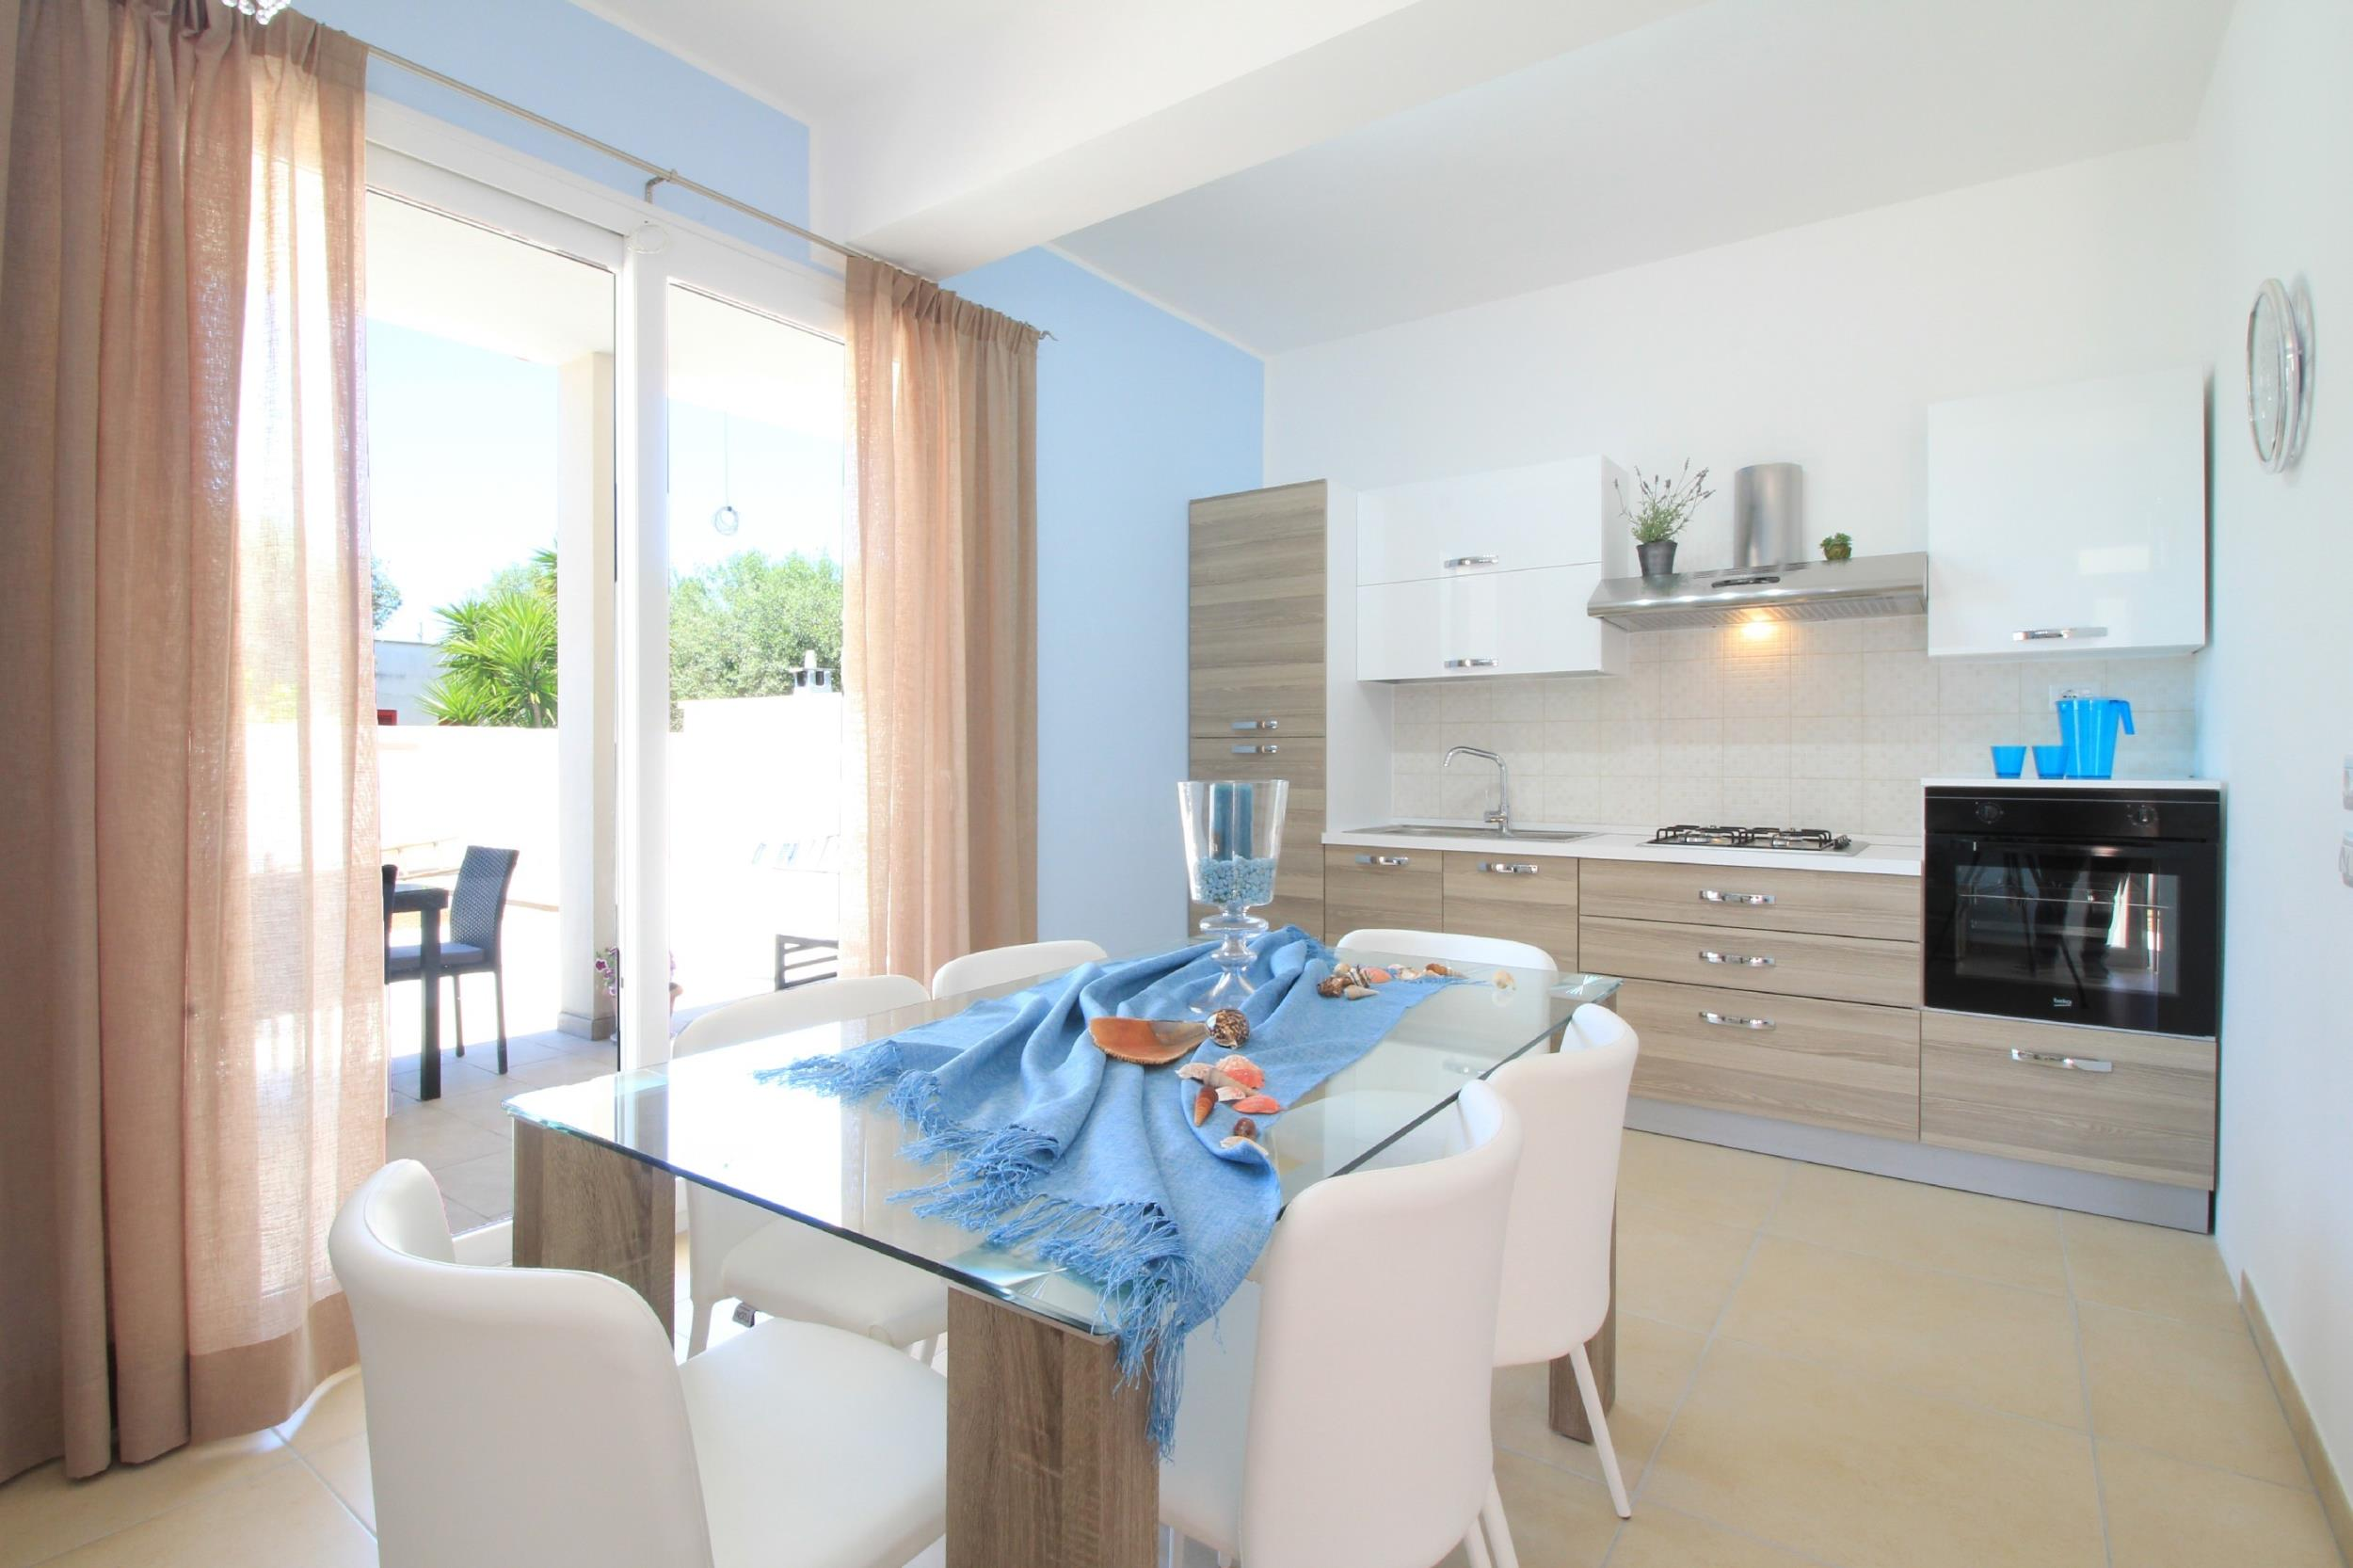 Apartment Elcisia luxe beach house photo 23457099